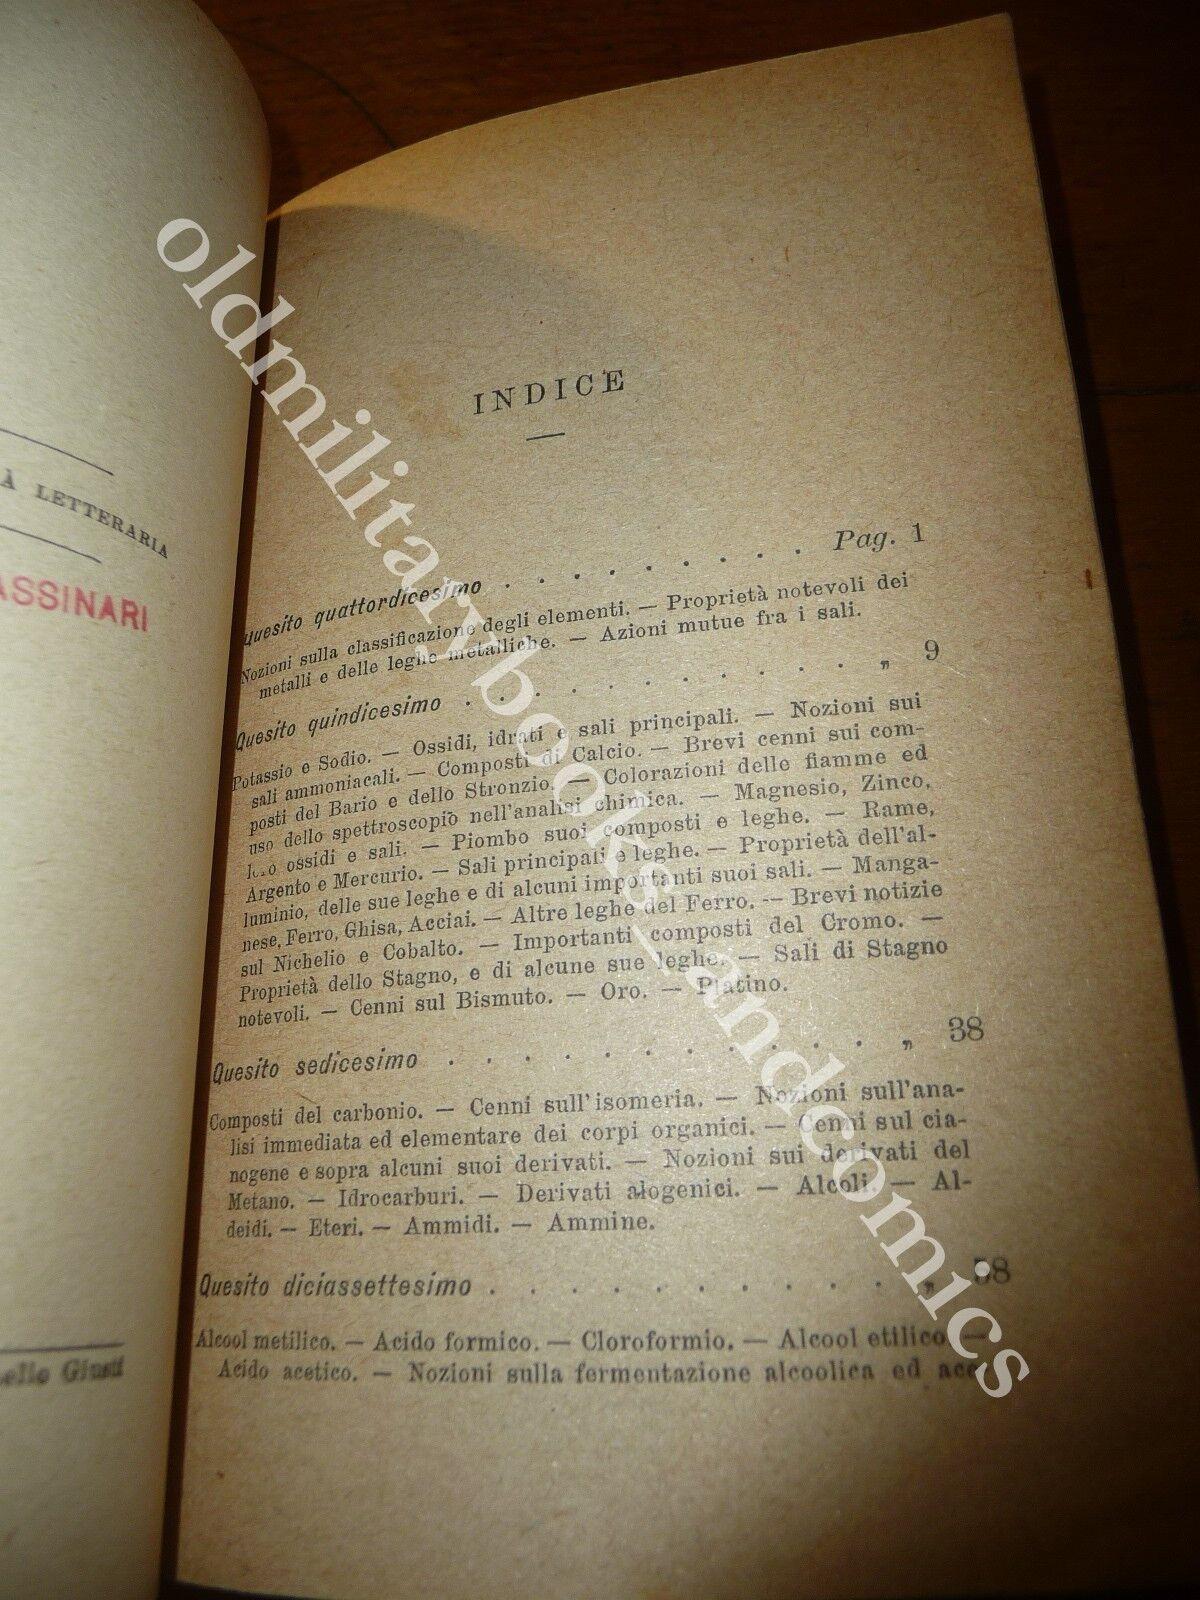 RIPETITORIO DI CHIMICA GABRIELE TASSINARI VOL. I E II 1920 BIBLIOTECA STUDENTI